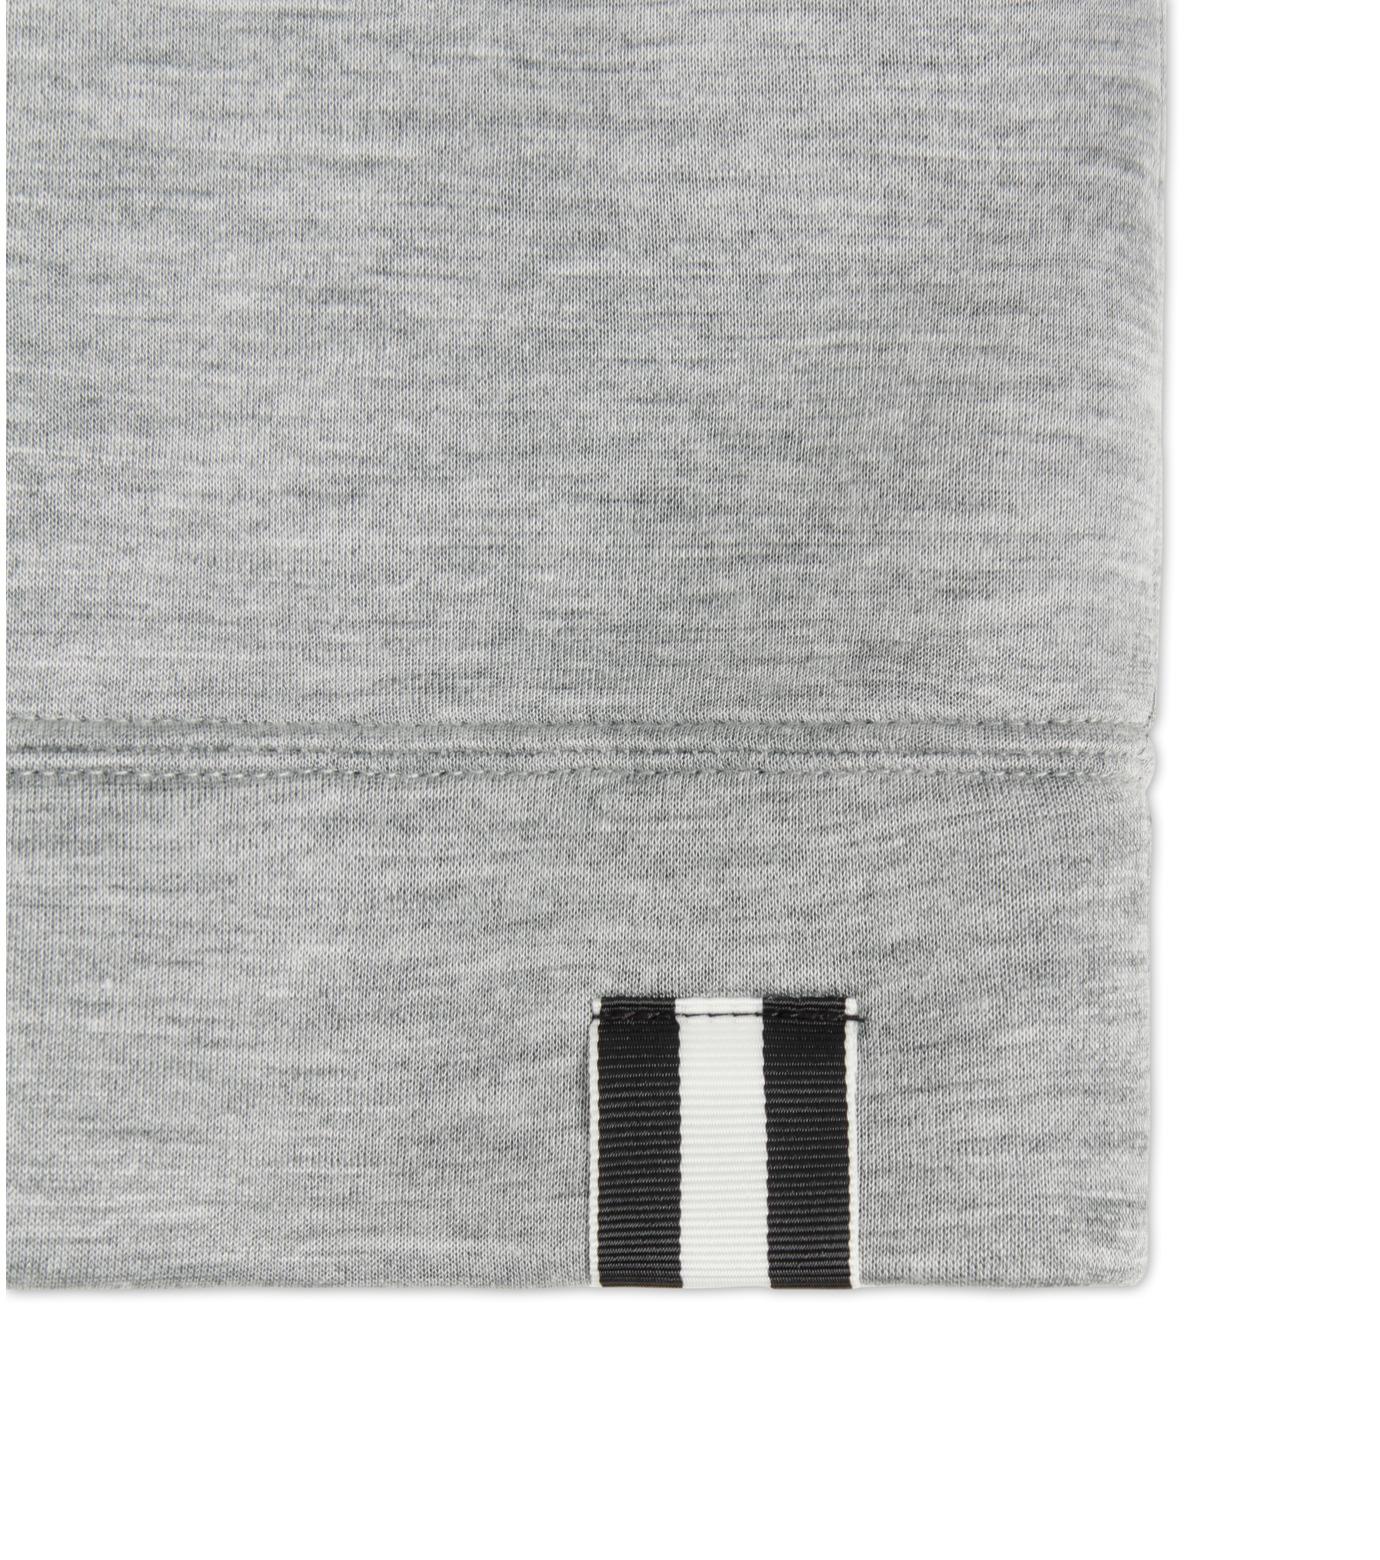 HL HEDDIE LOVU(エイチエル・エディールーヴ)のBONDING SWEATSHIRT-LIGHT GRAY(カットソー/cut and sewn)-18S92001-10 拡大詳細画像6